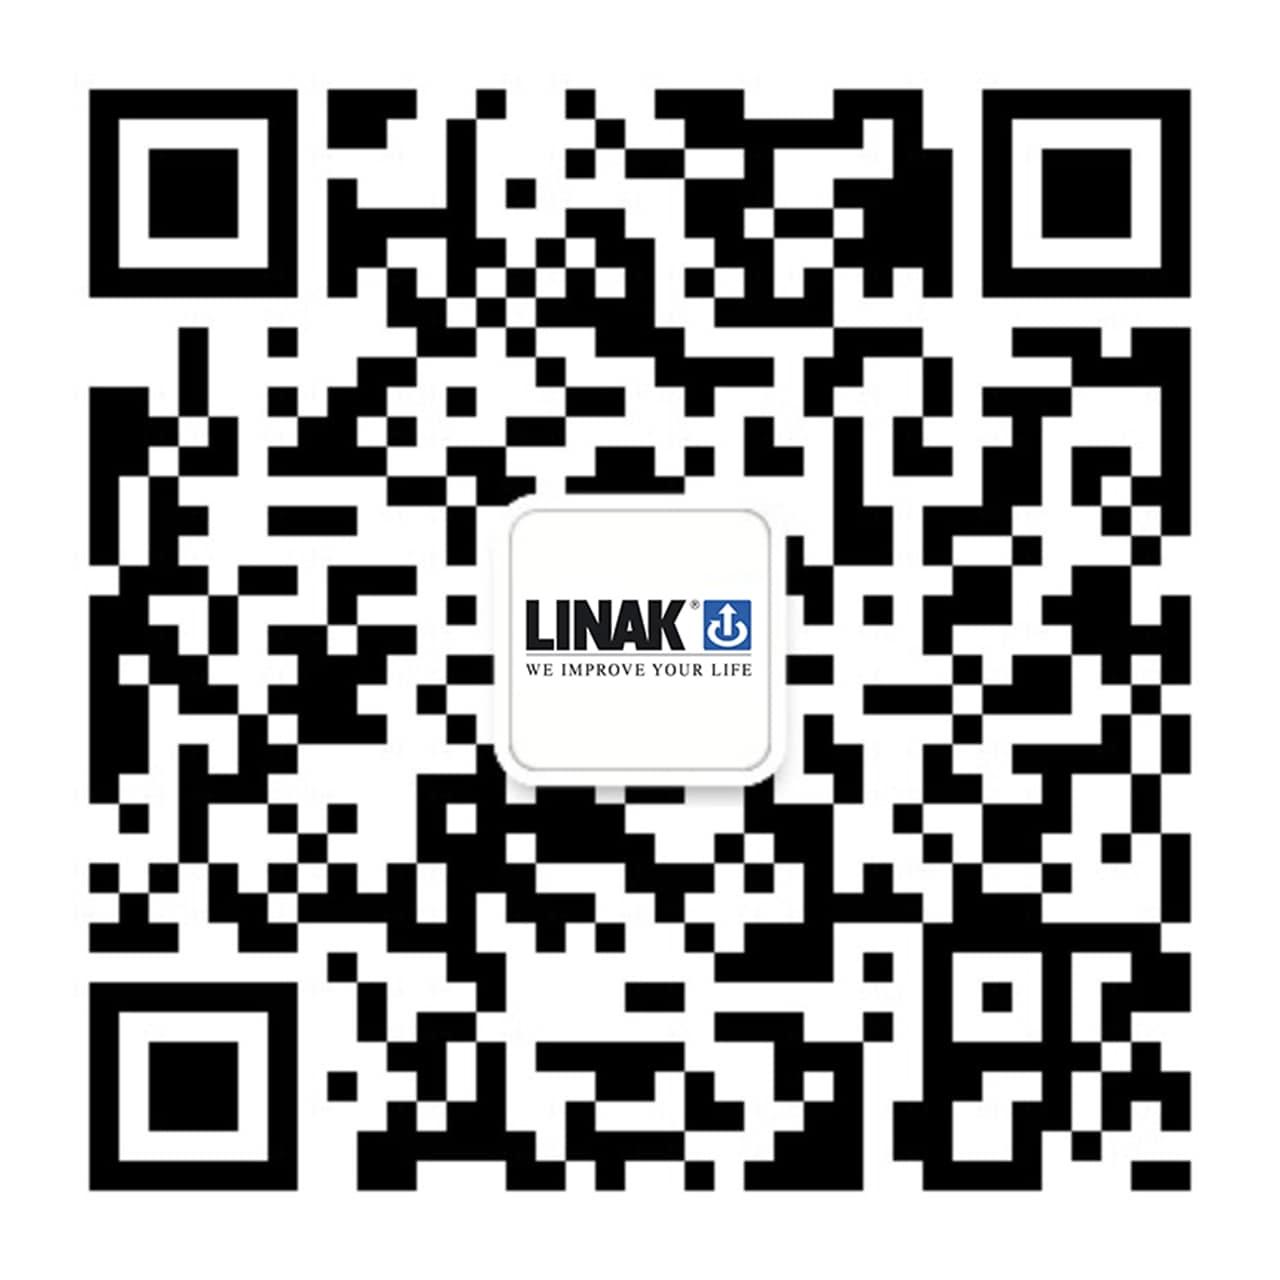 LINAK 中国微信